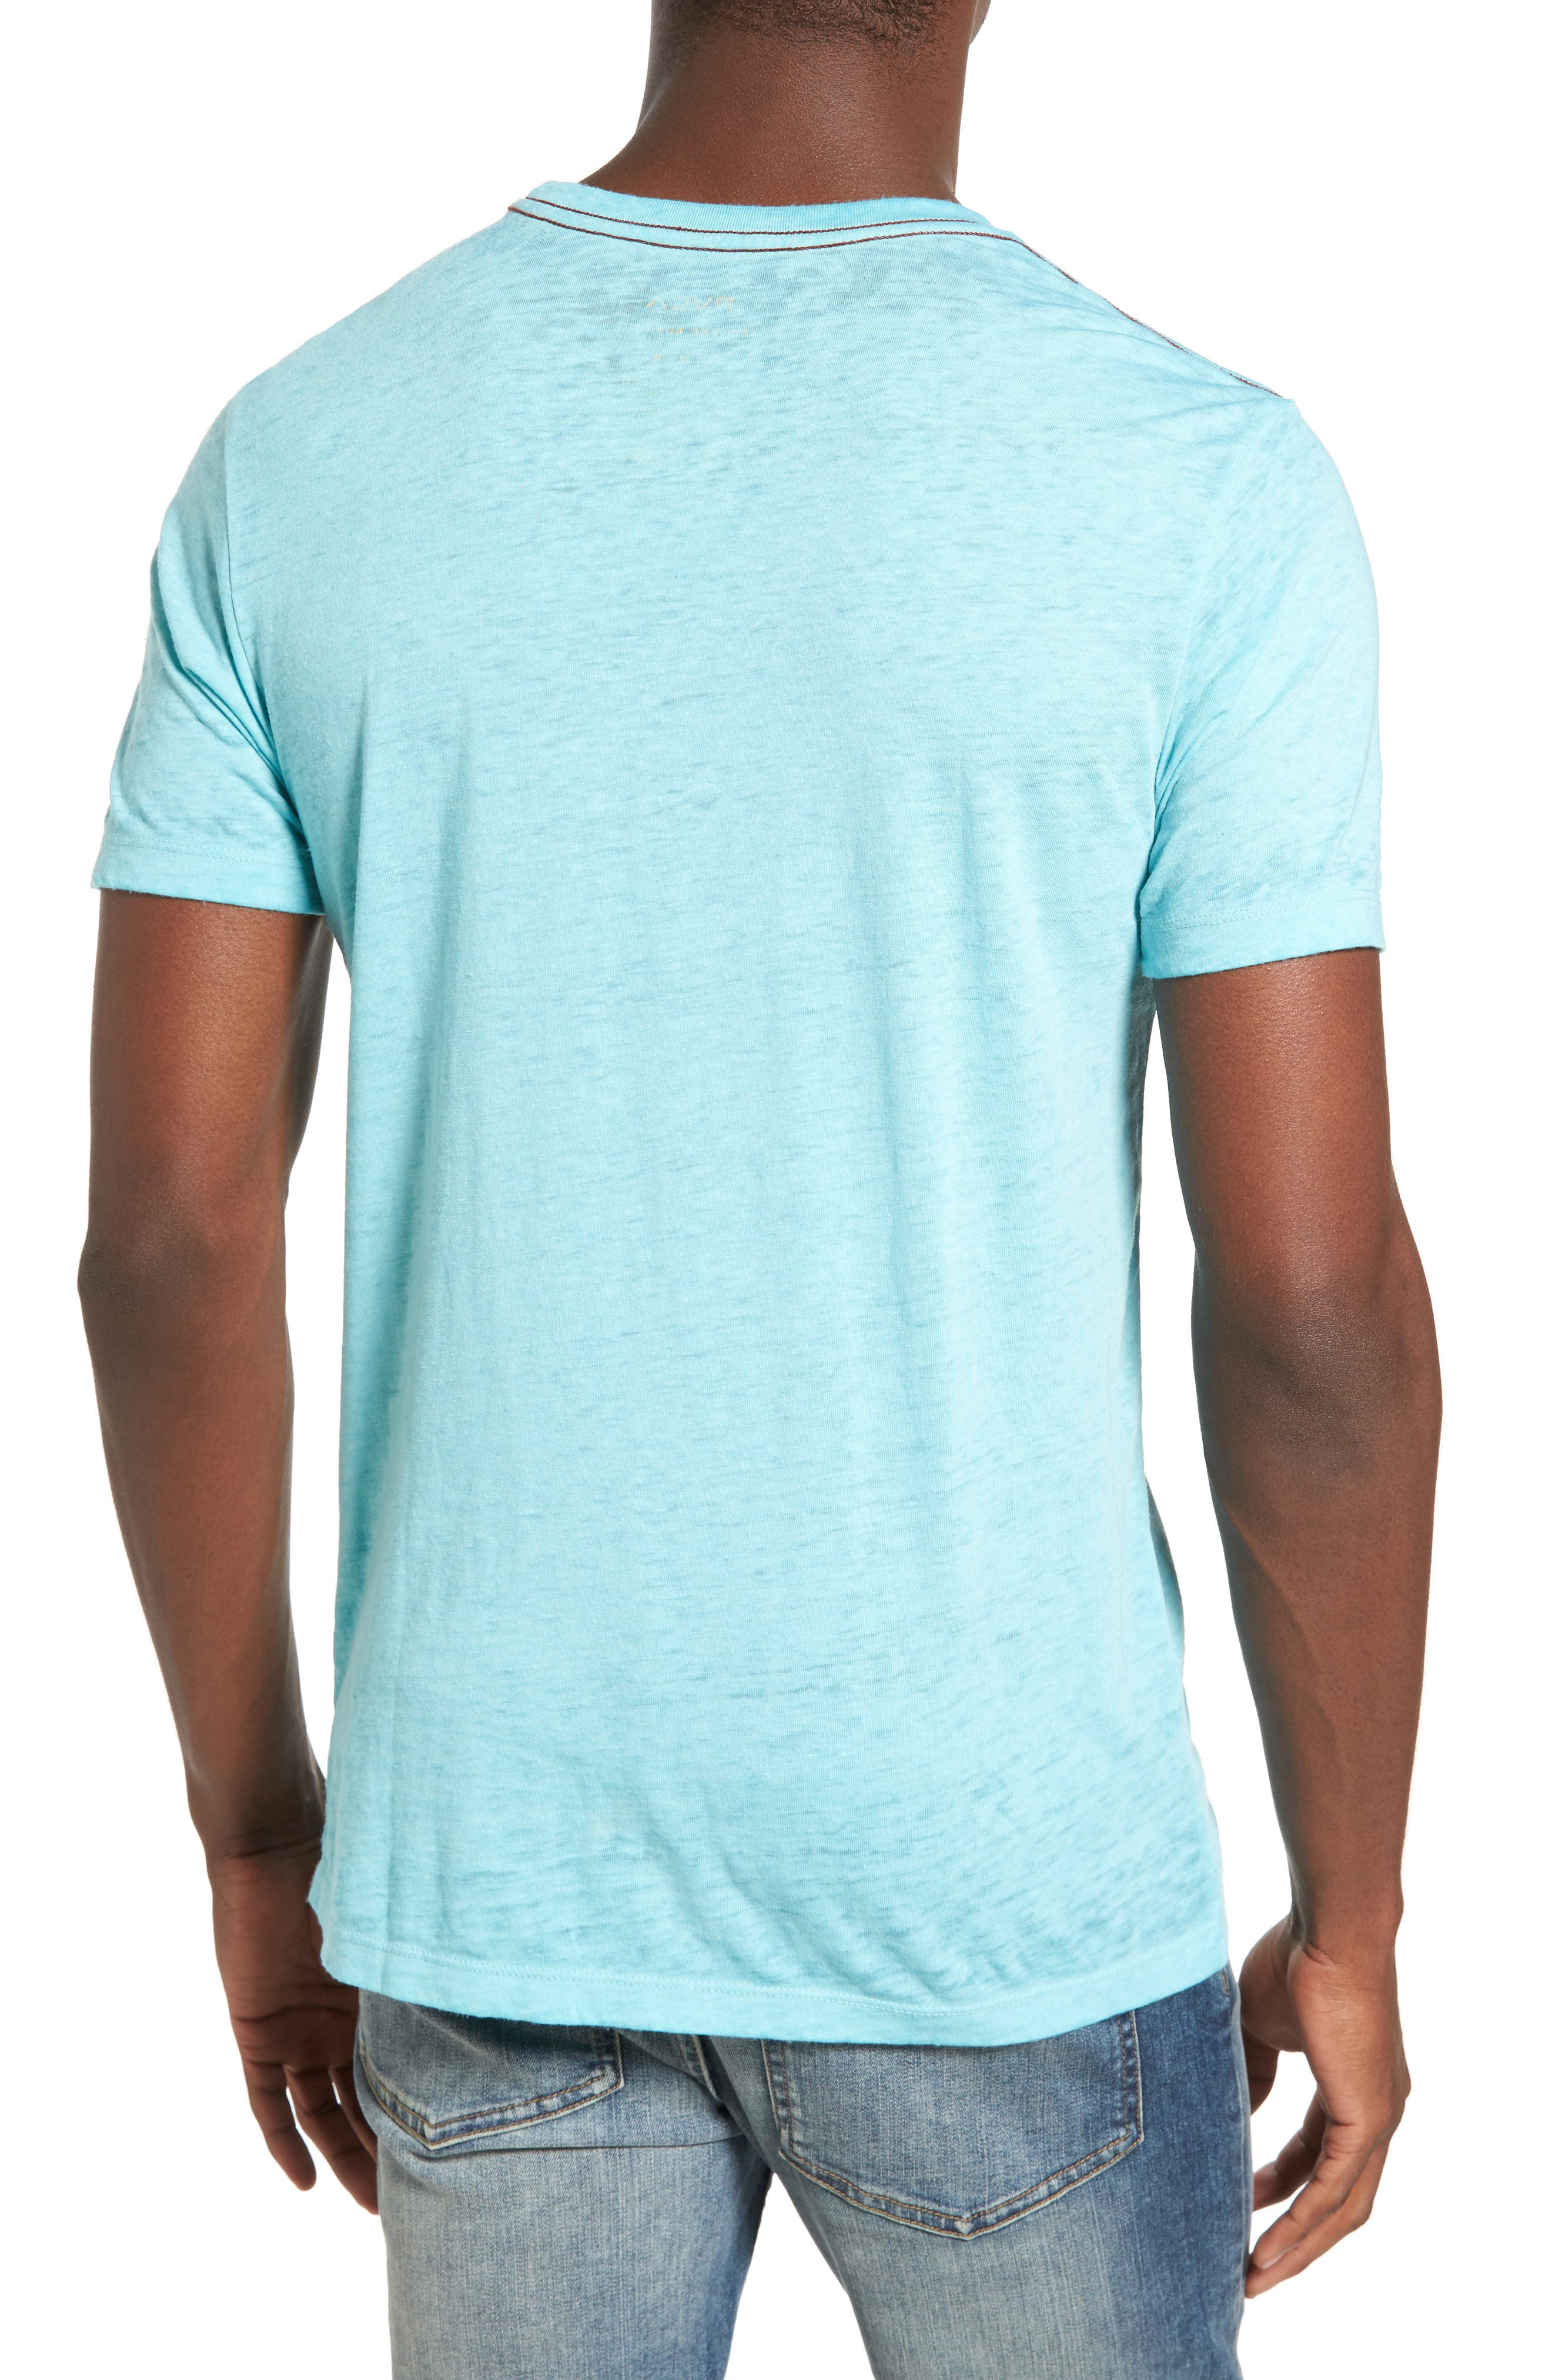 Balance Process T-Shirt,                             Alternate thumbnail 8, color,